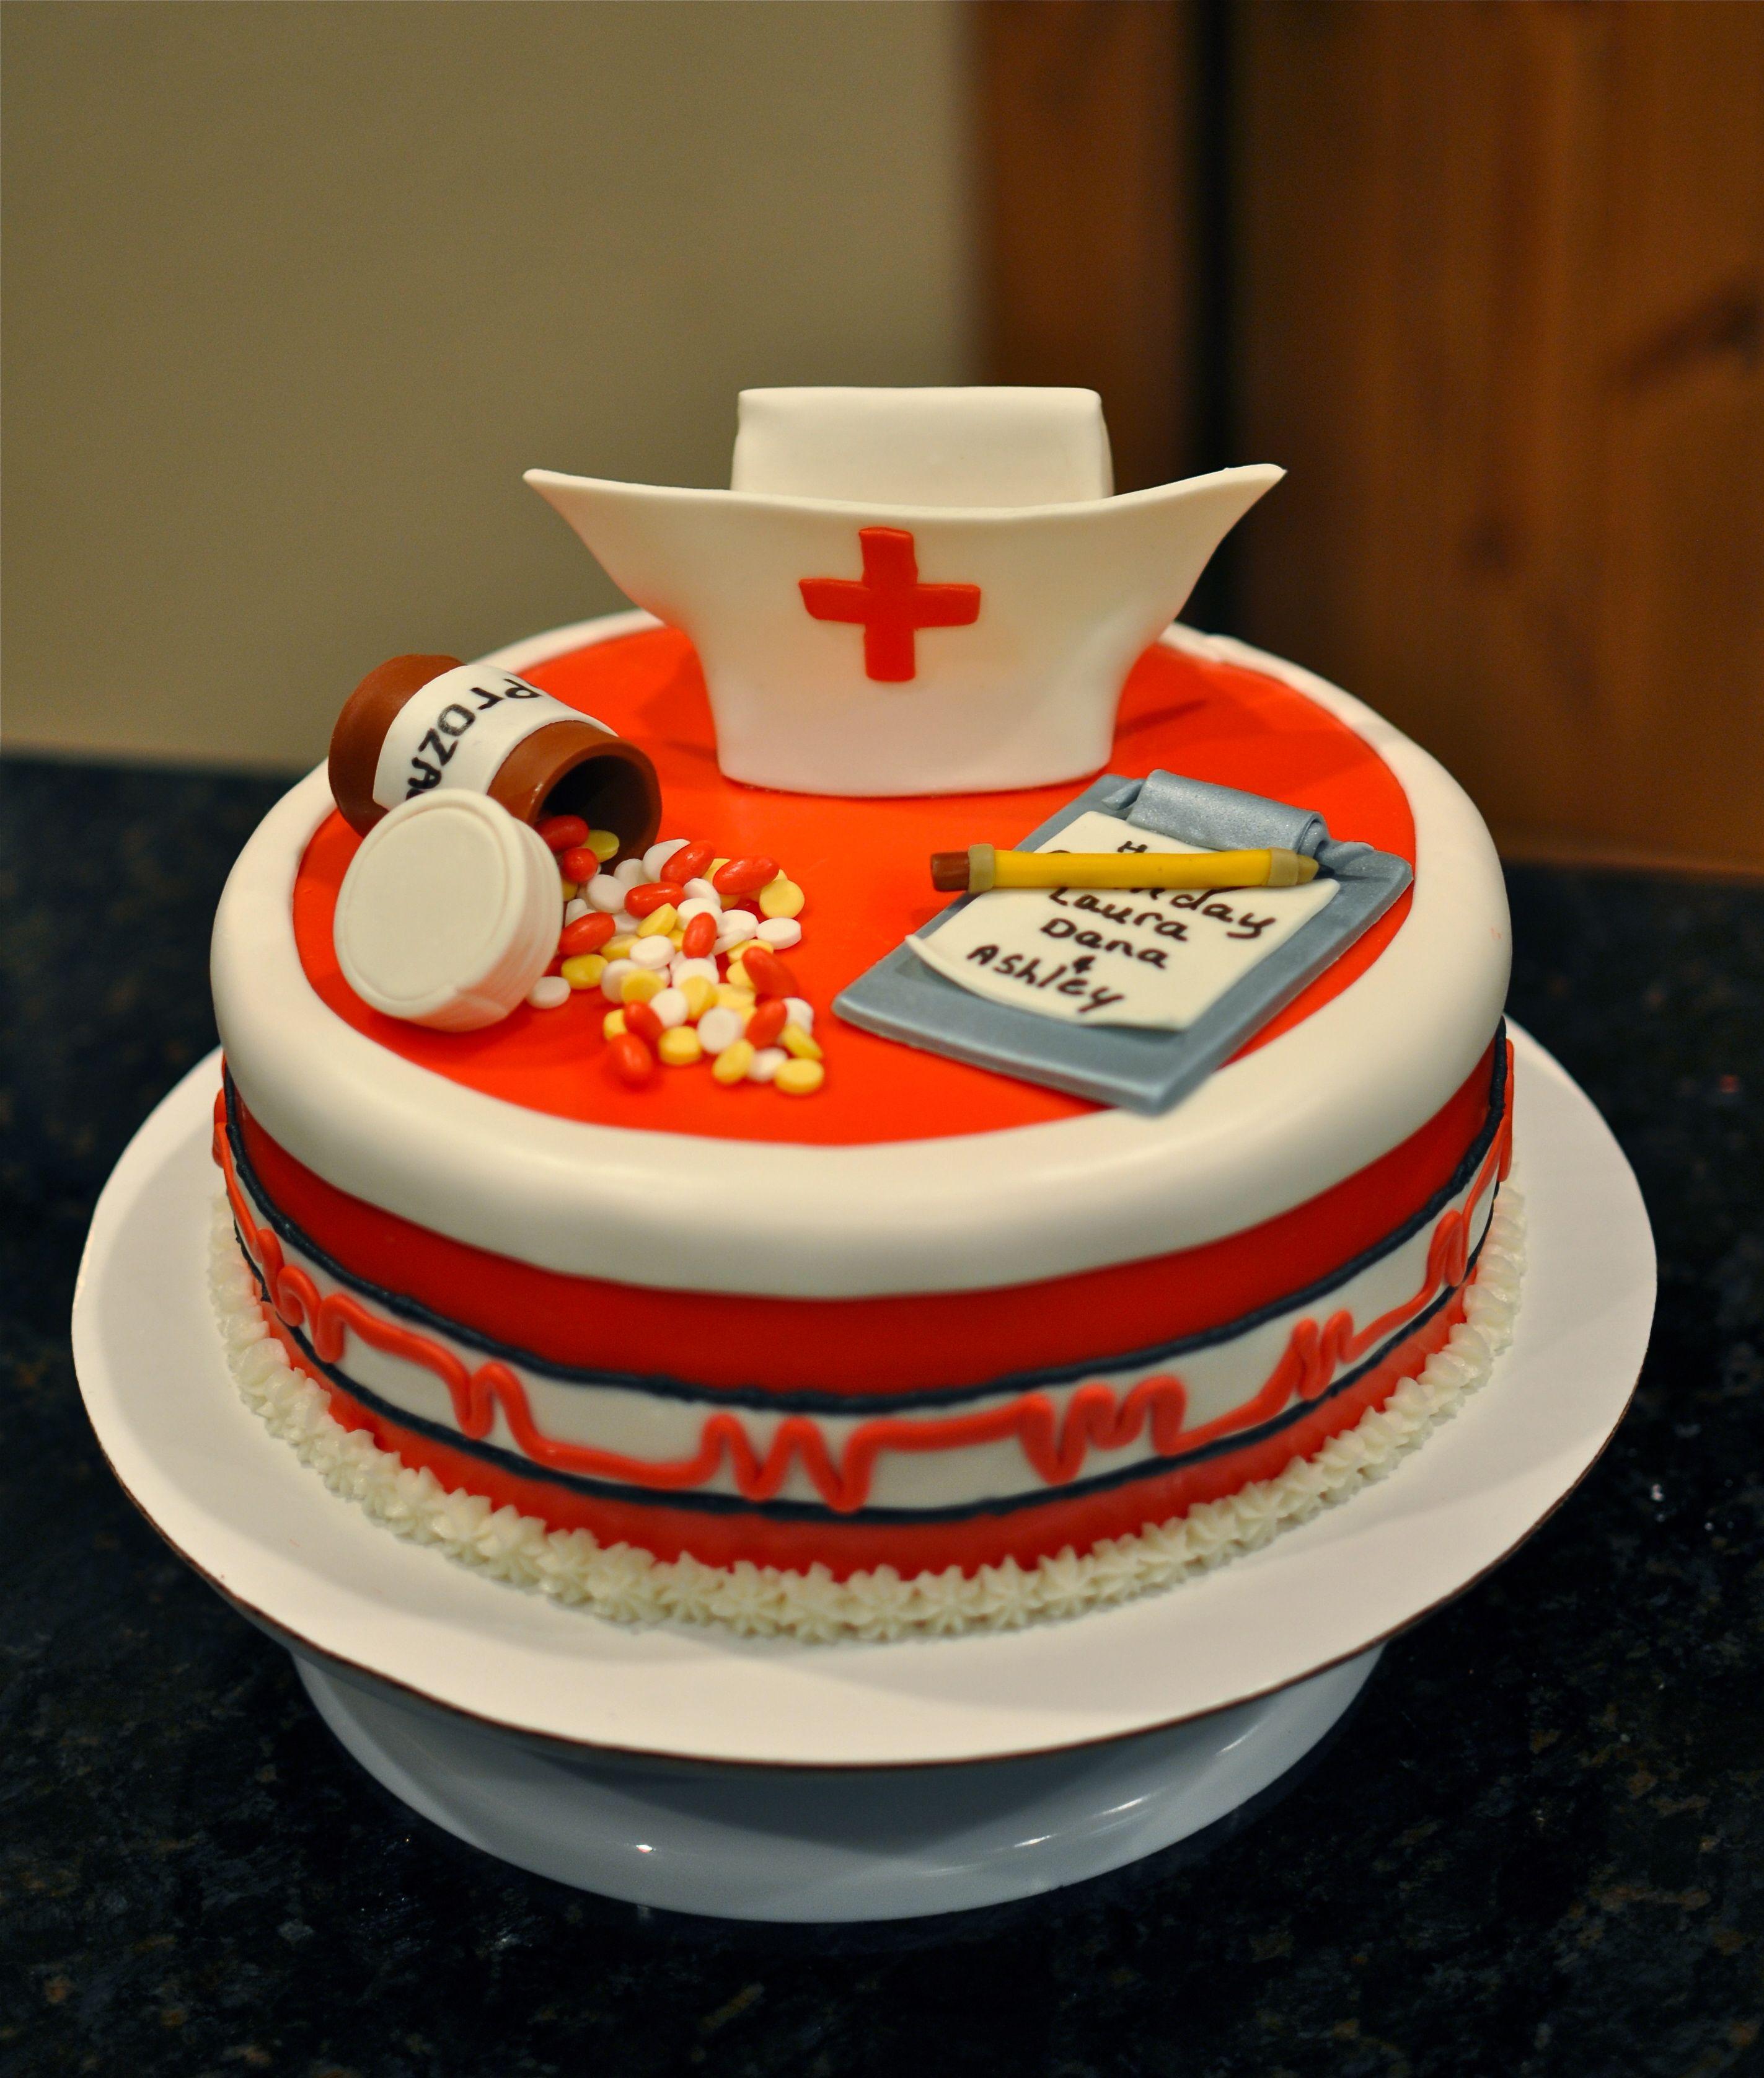 Nurses birthday cake My Cakes - Facebook.com/cakebyorder ...